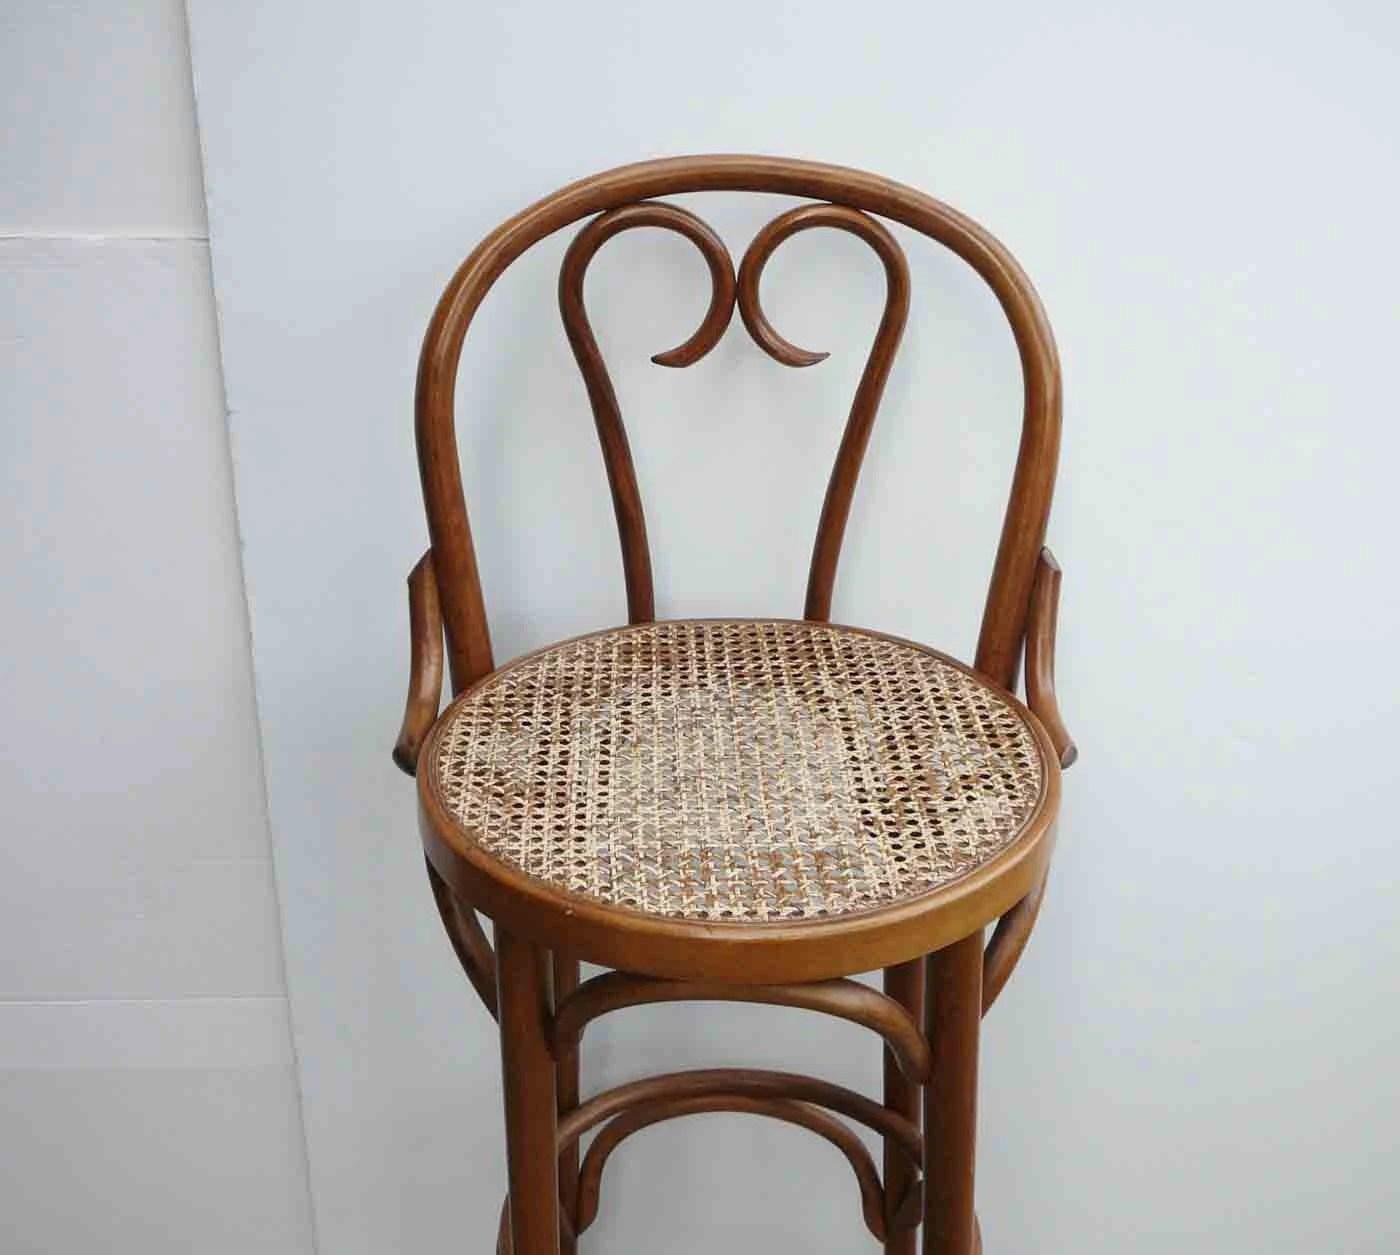 Vintage Rattan Stool Boho Chic Mid Century Chair Bohemian ...